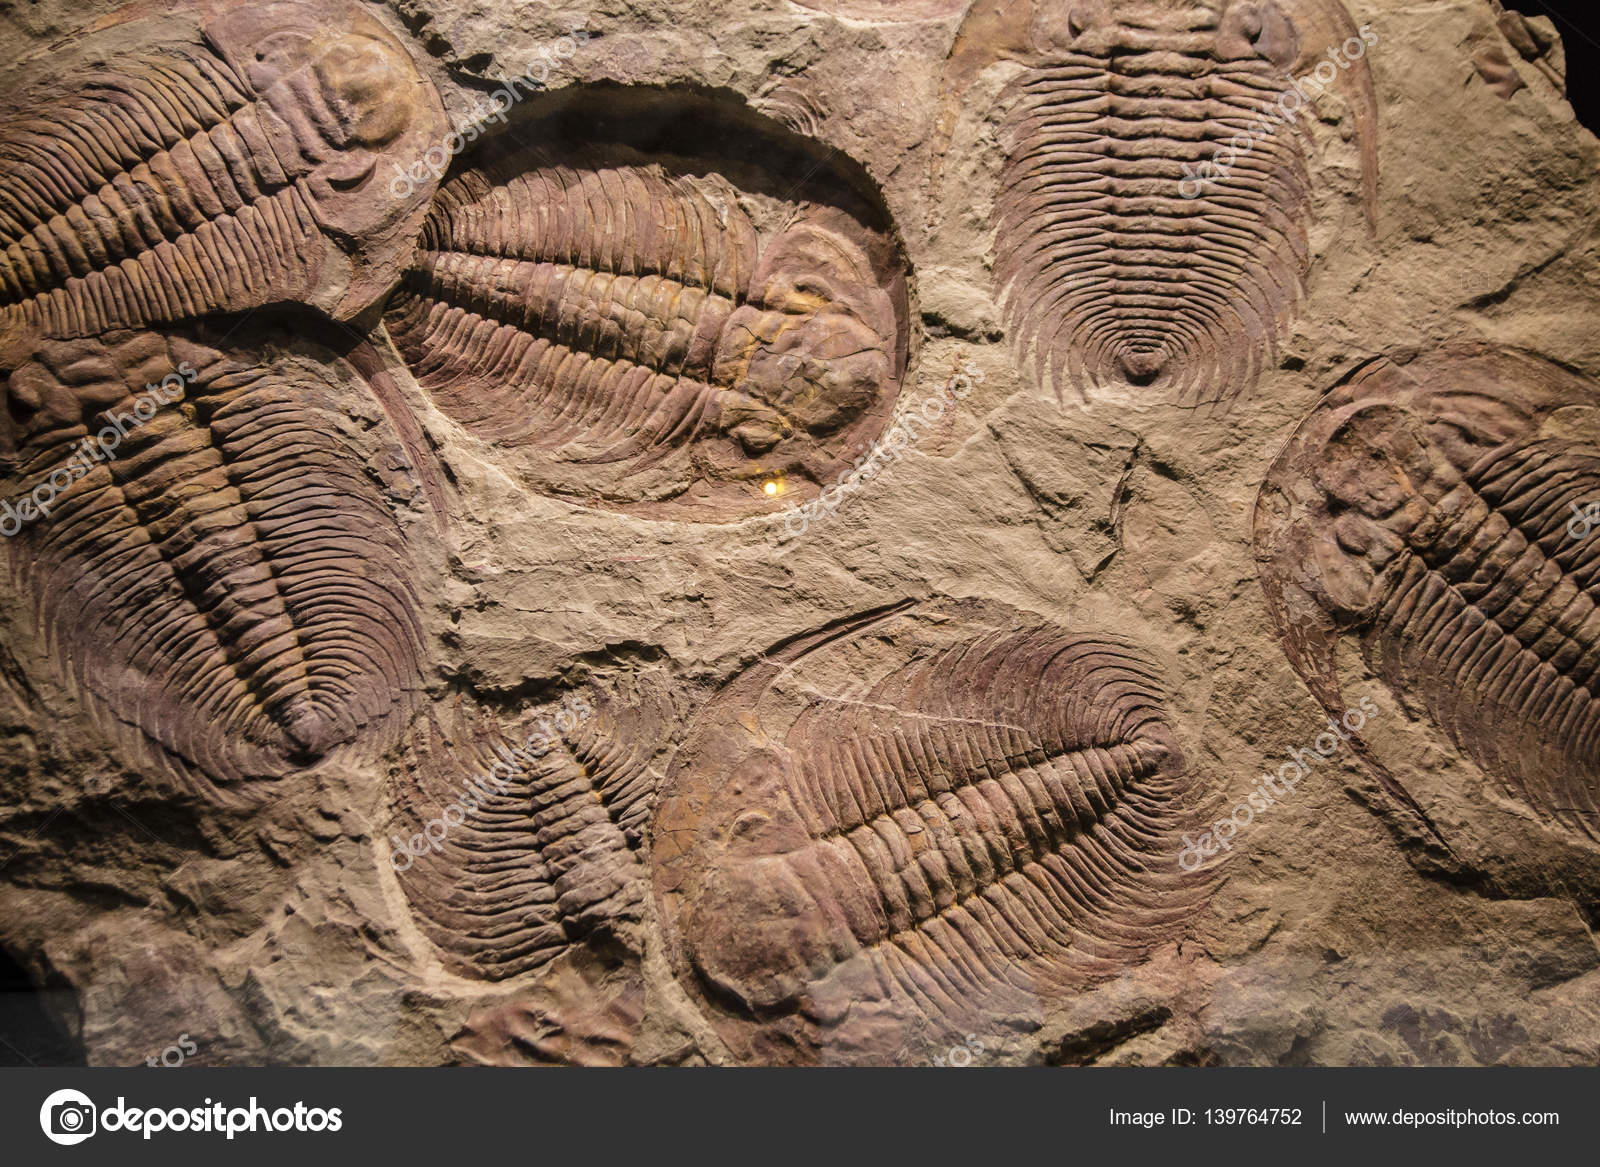 https://st3.depositphotos.com/5545264/13976/i/1600/depositphotos_139764752-stock-photo-fossil-trilobite-imprint-in-the.jpg